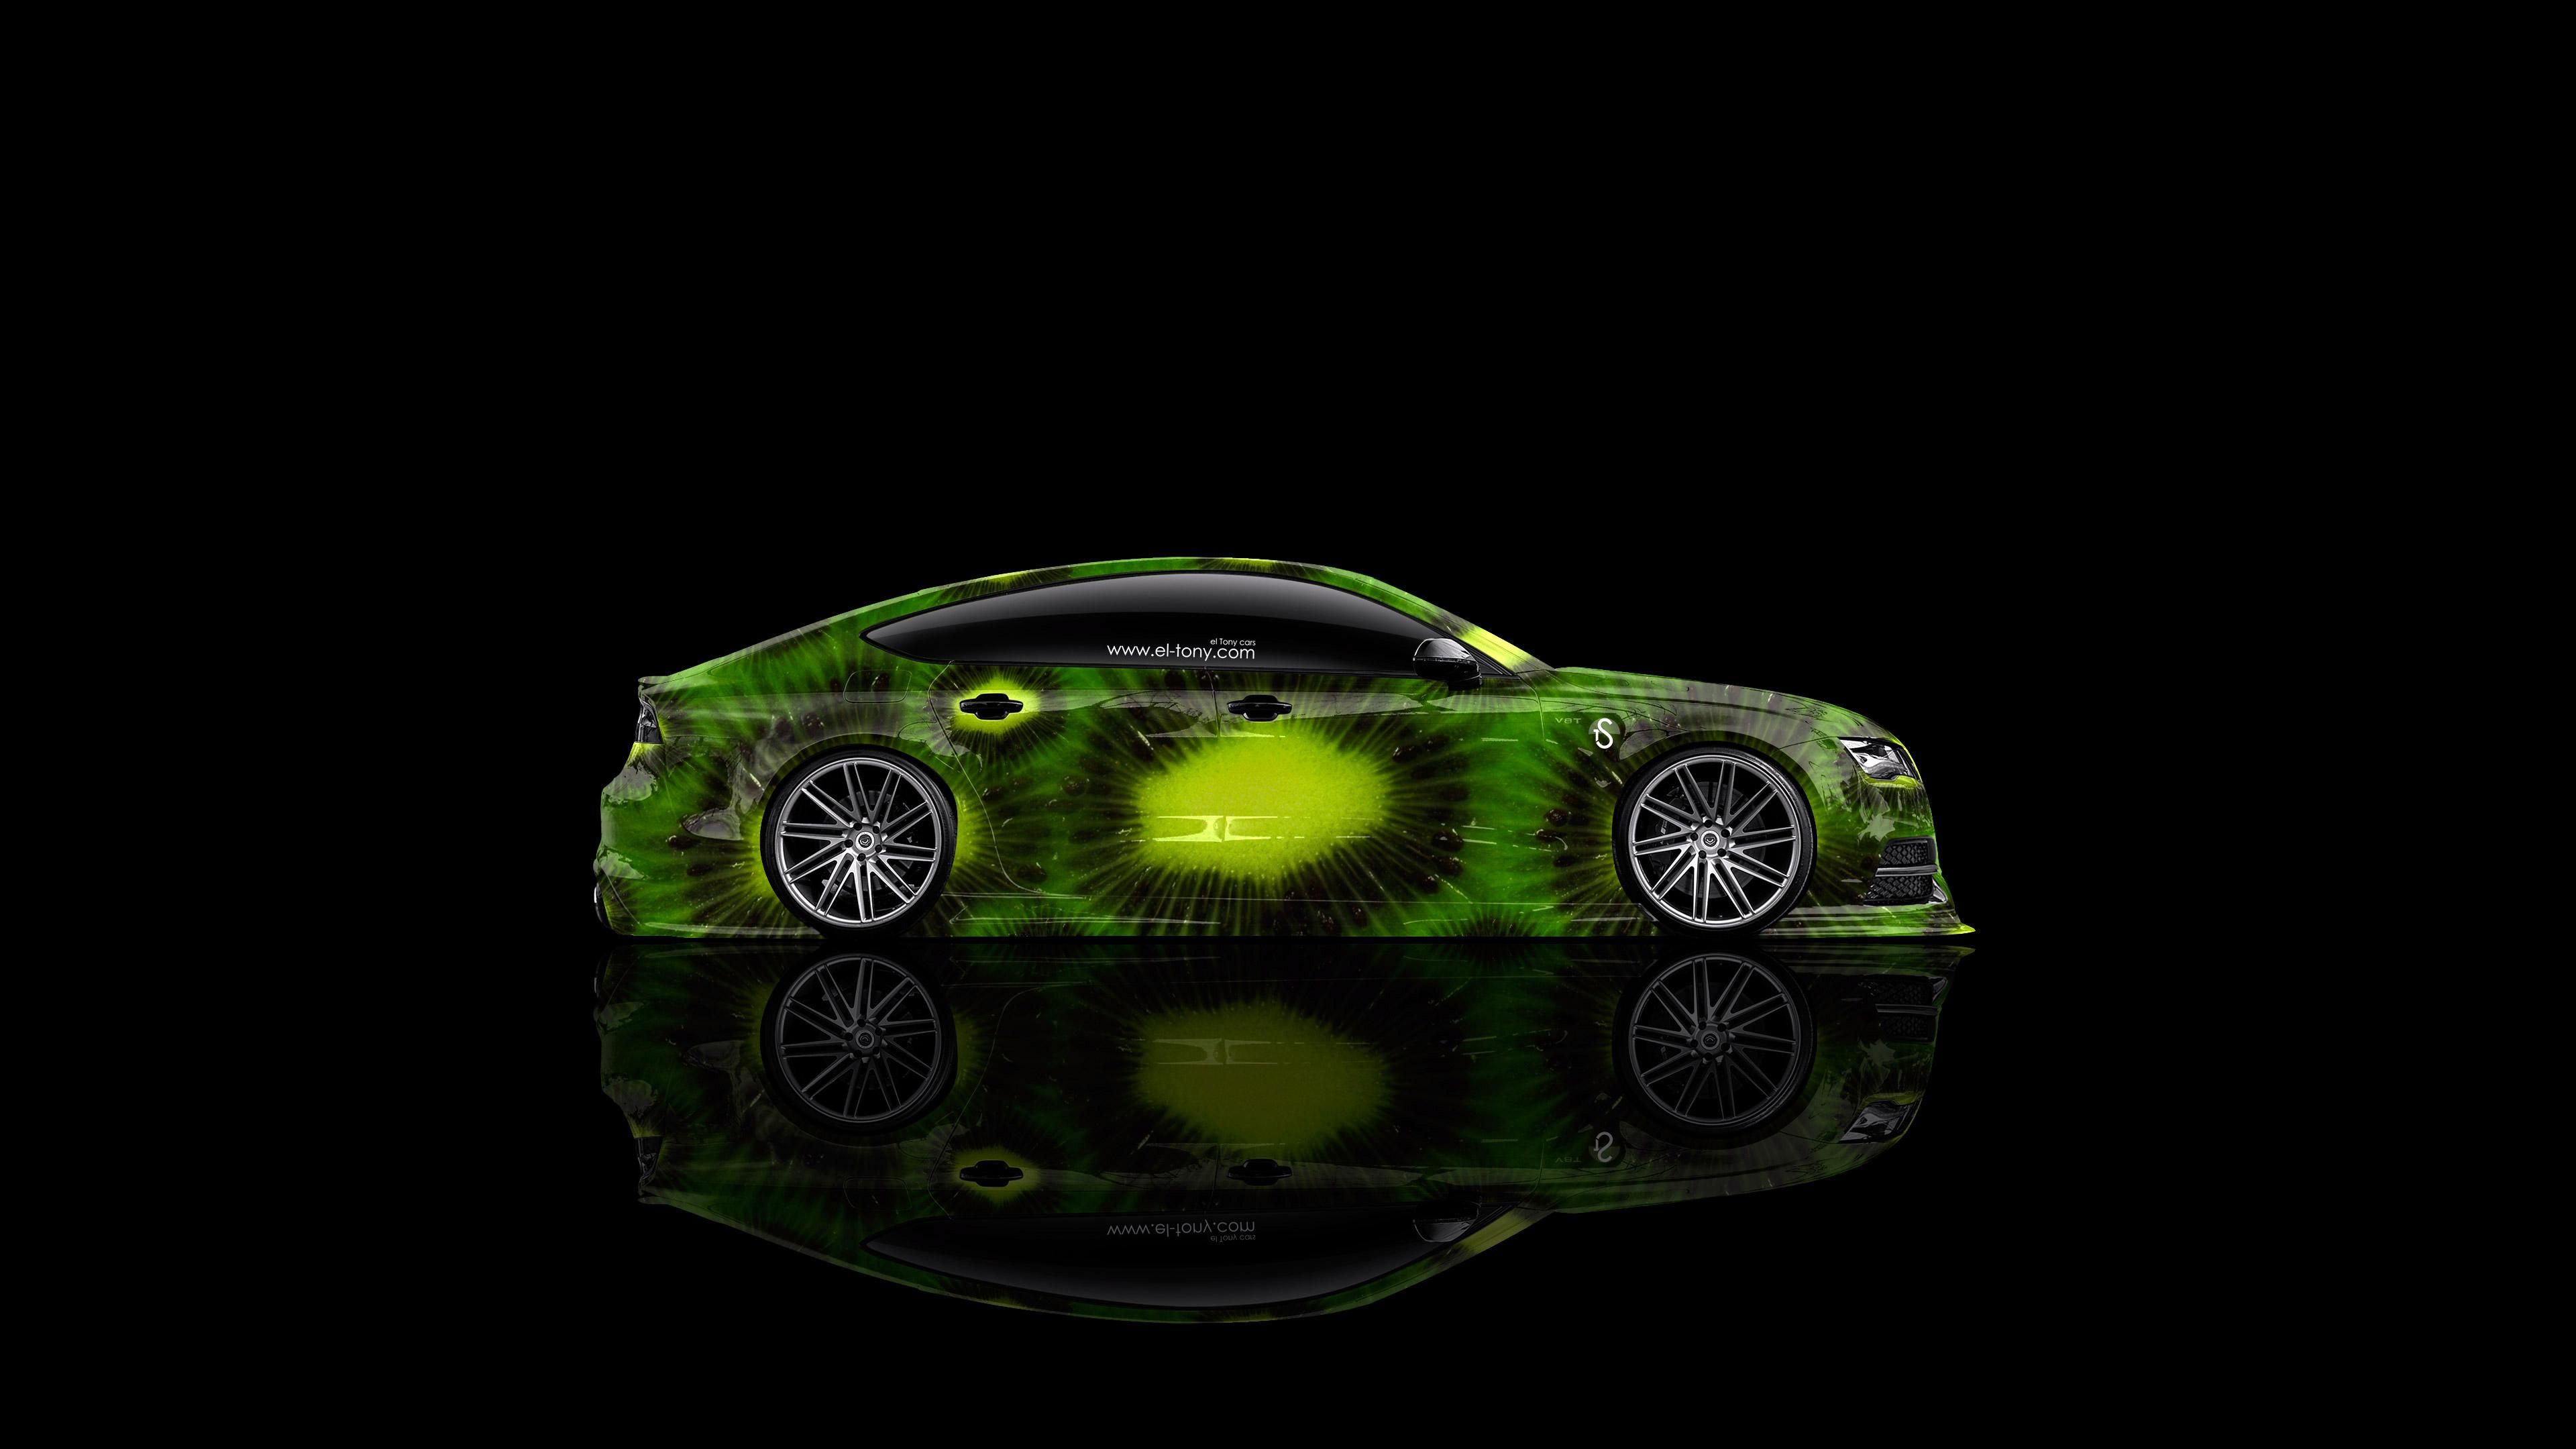 Nice «Audi RS7 Side Kiwi Aerography Car  2014 Green Colors 4K Wallpapers Design By Tony Kokhan Www.el Tony.com_  (3840×2160) 4K Audi RS7 Side Kiwi Aerography ...